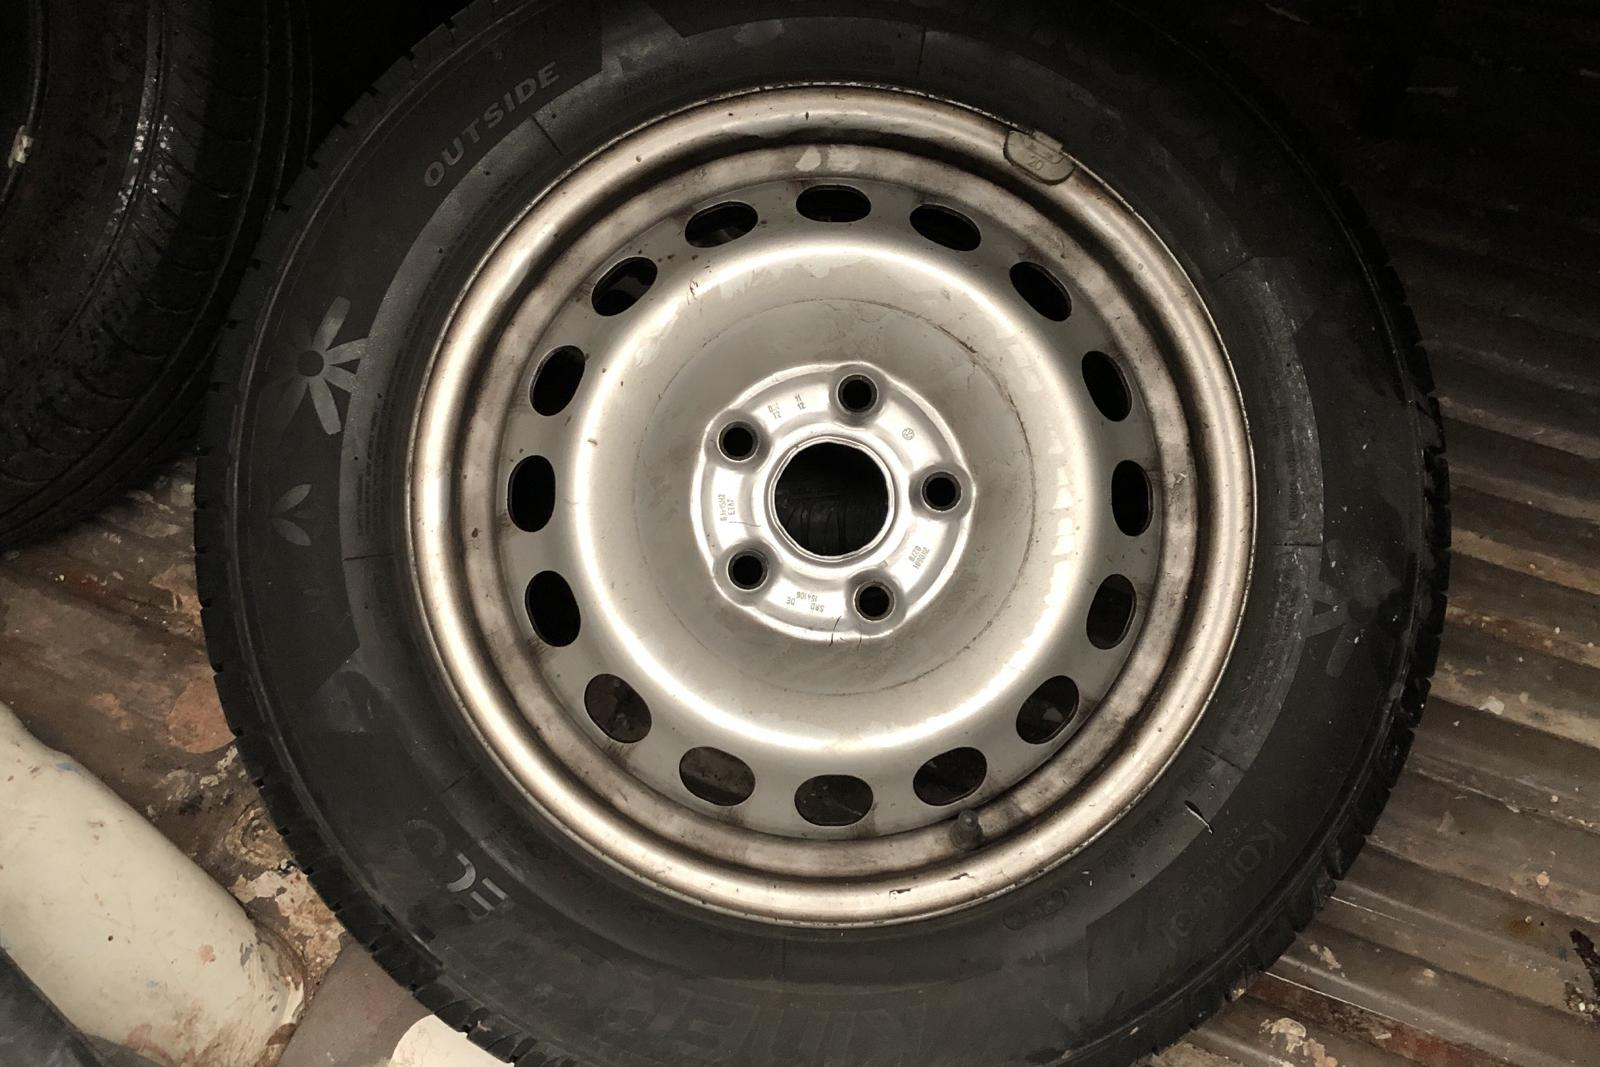 VW Caddy 1.4 Skåp (75hk) - 12 478 mil - Manuell - vit - 2006